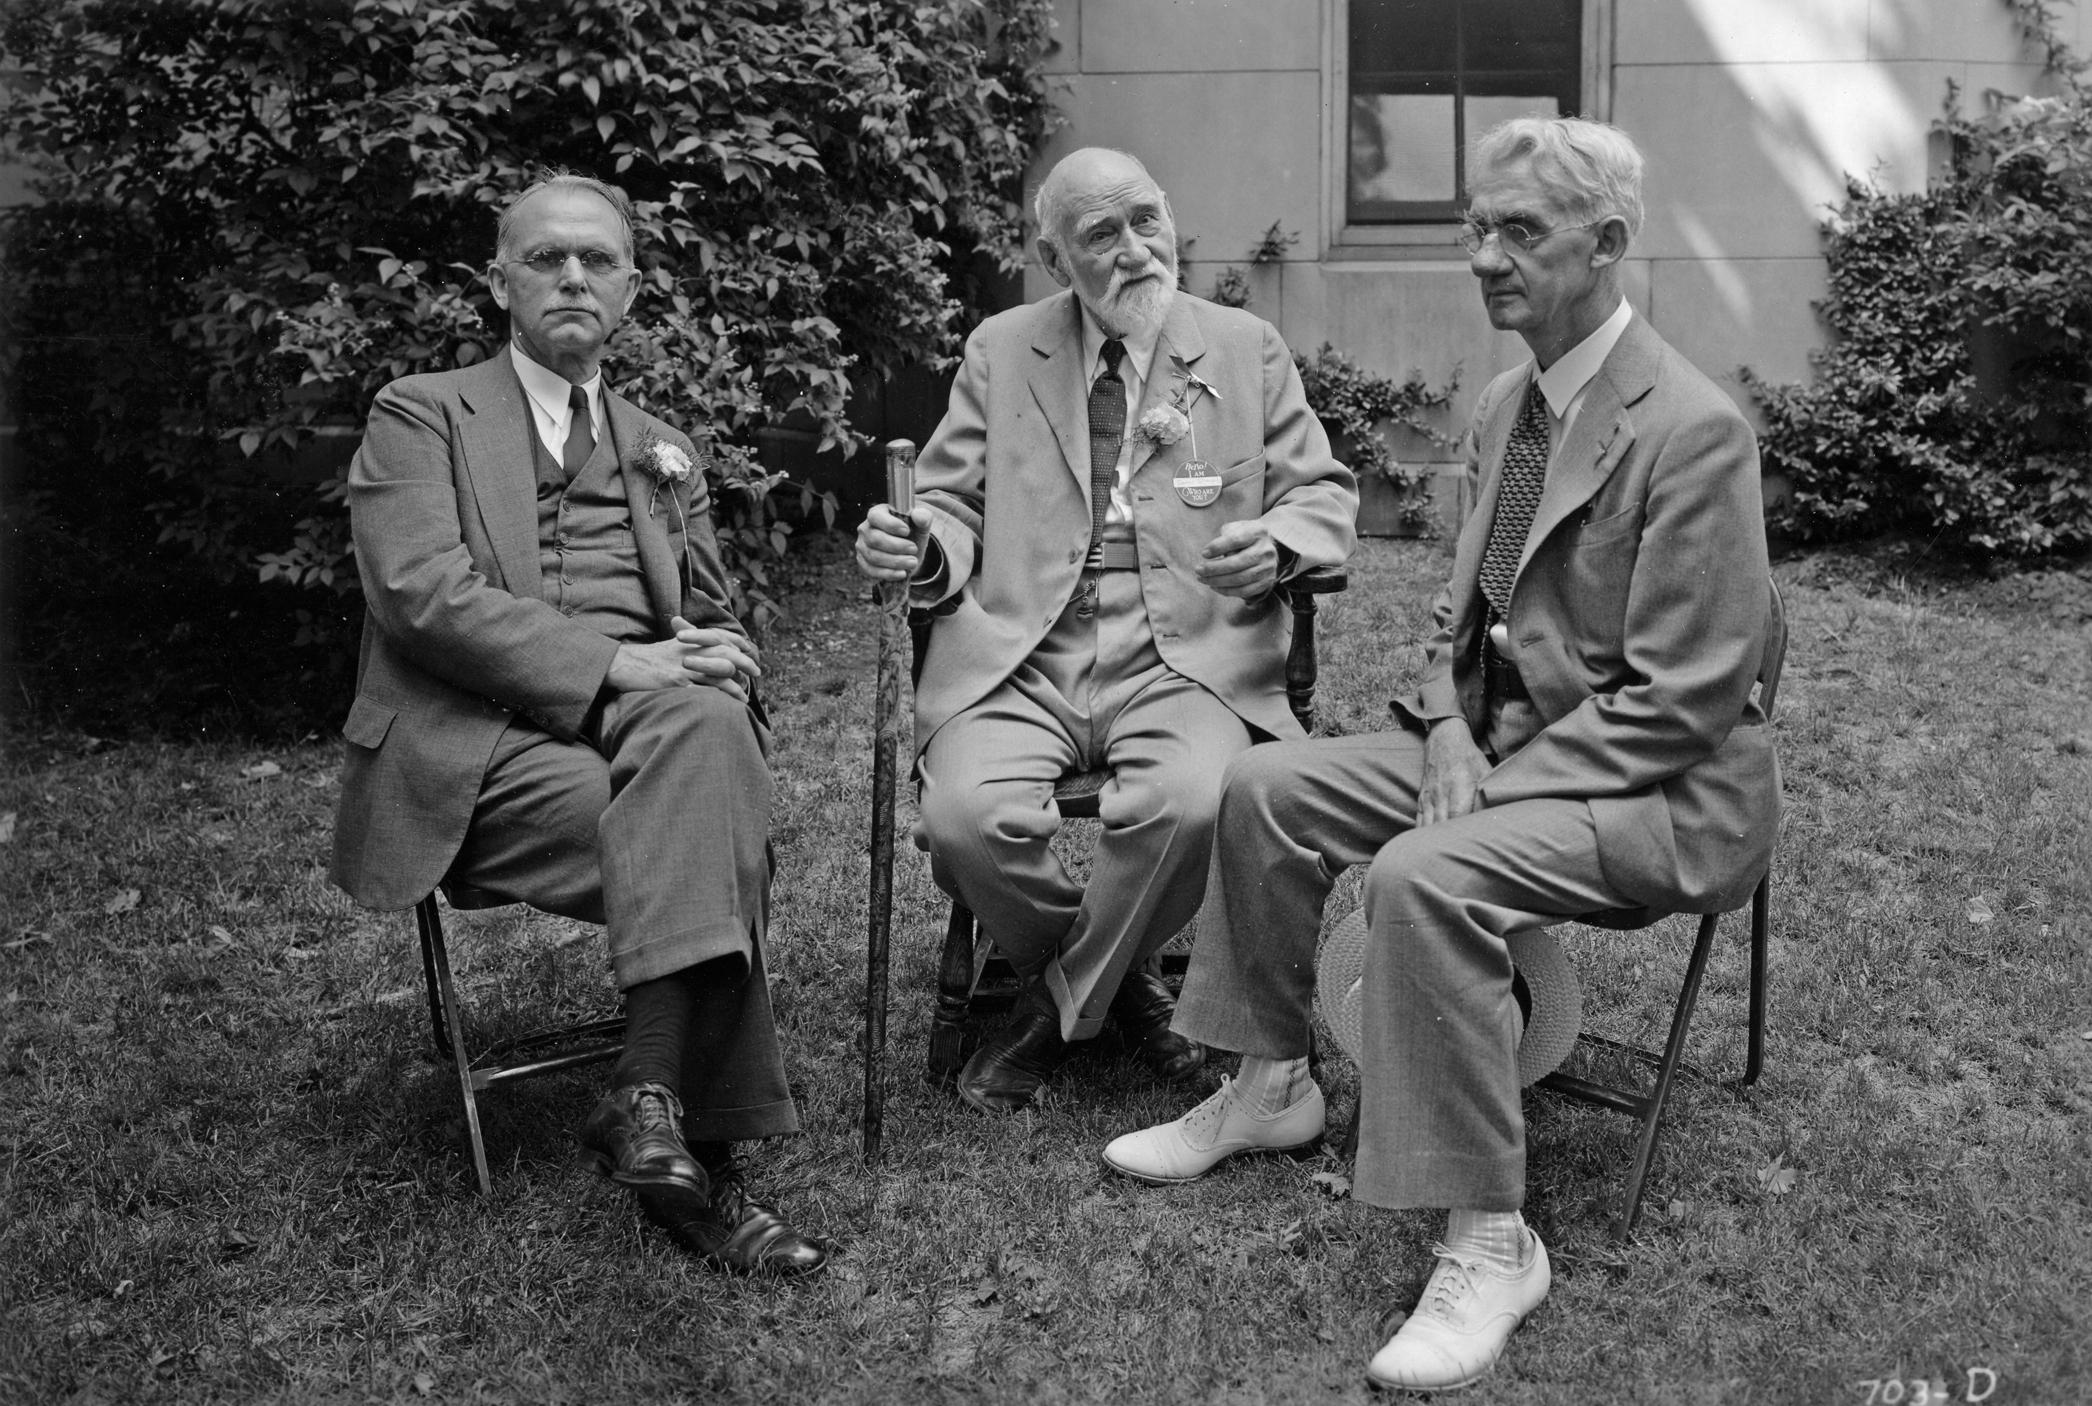 Ray Baker, Daniel Strange, and MSU President Shaw, June 10, 1939